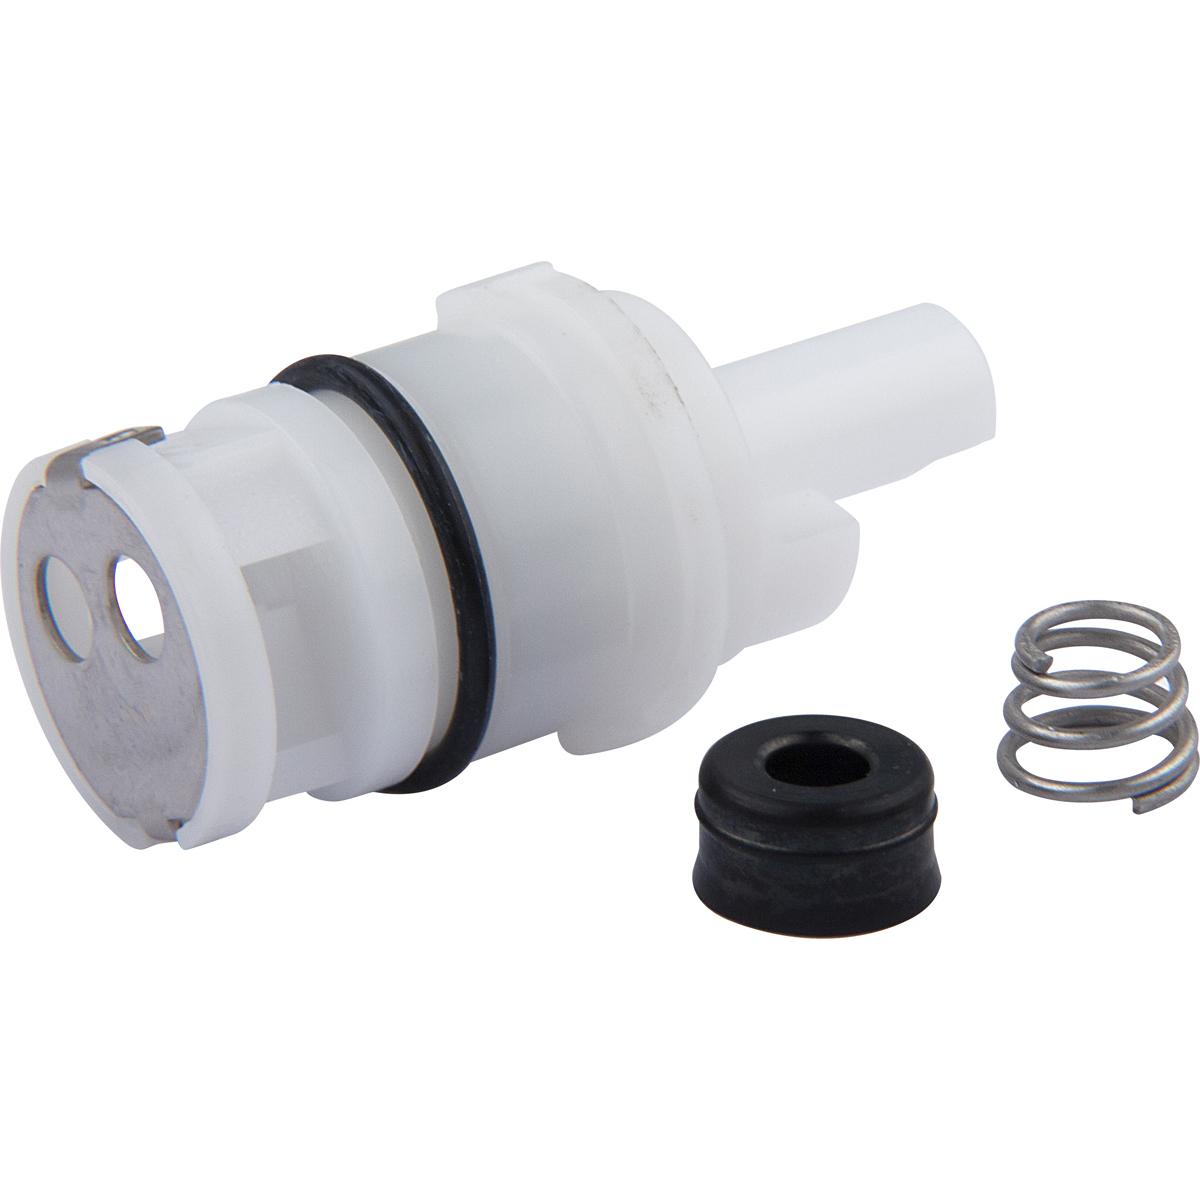 globe union faucet repair kit plastic